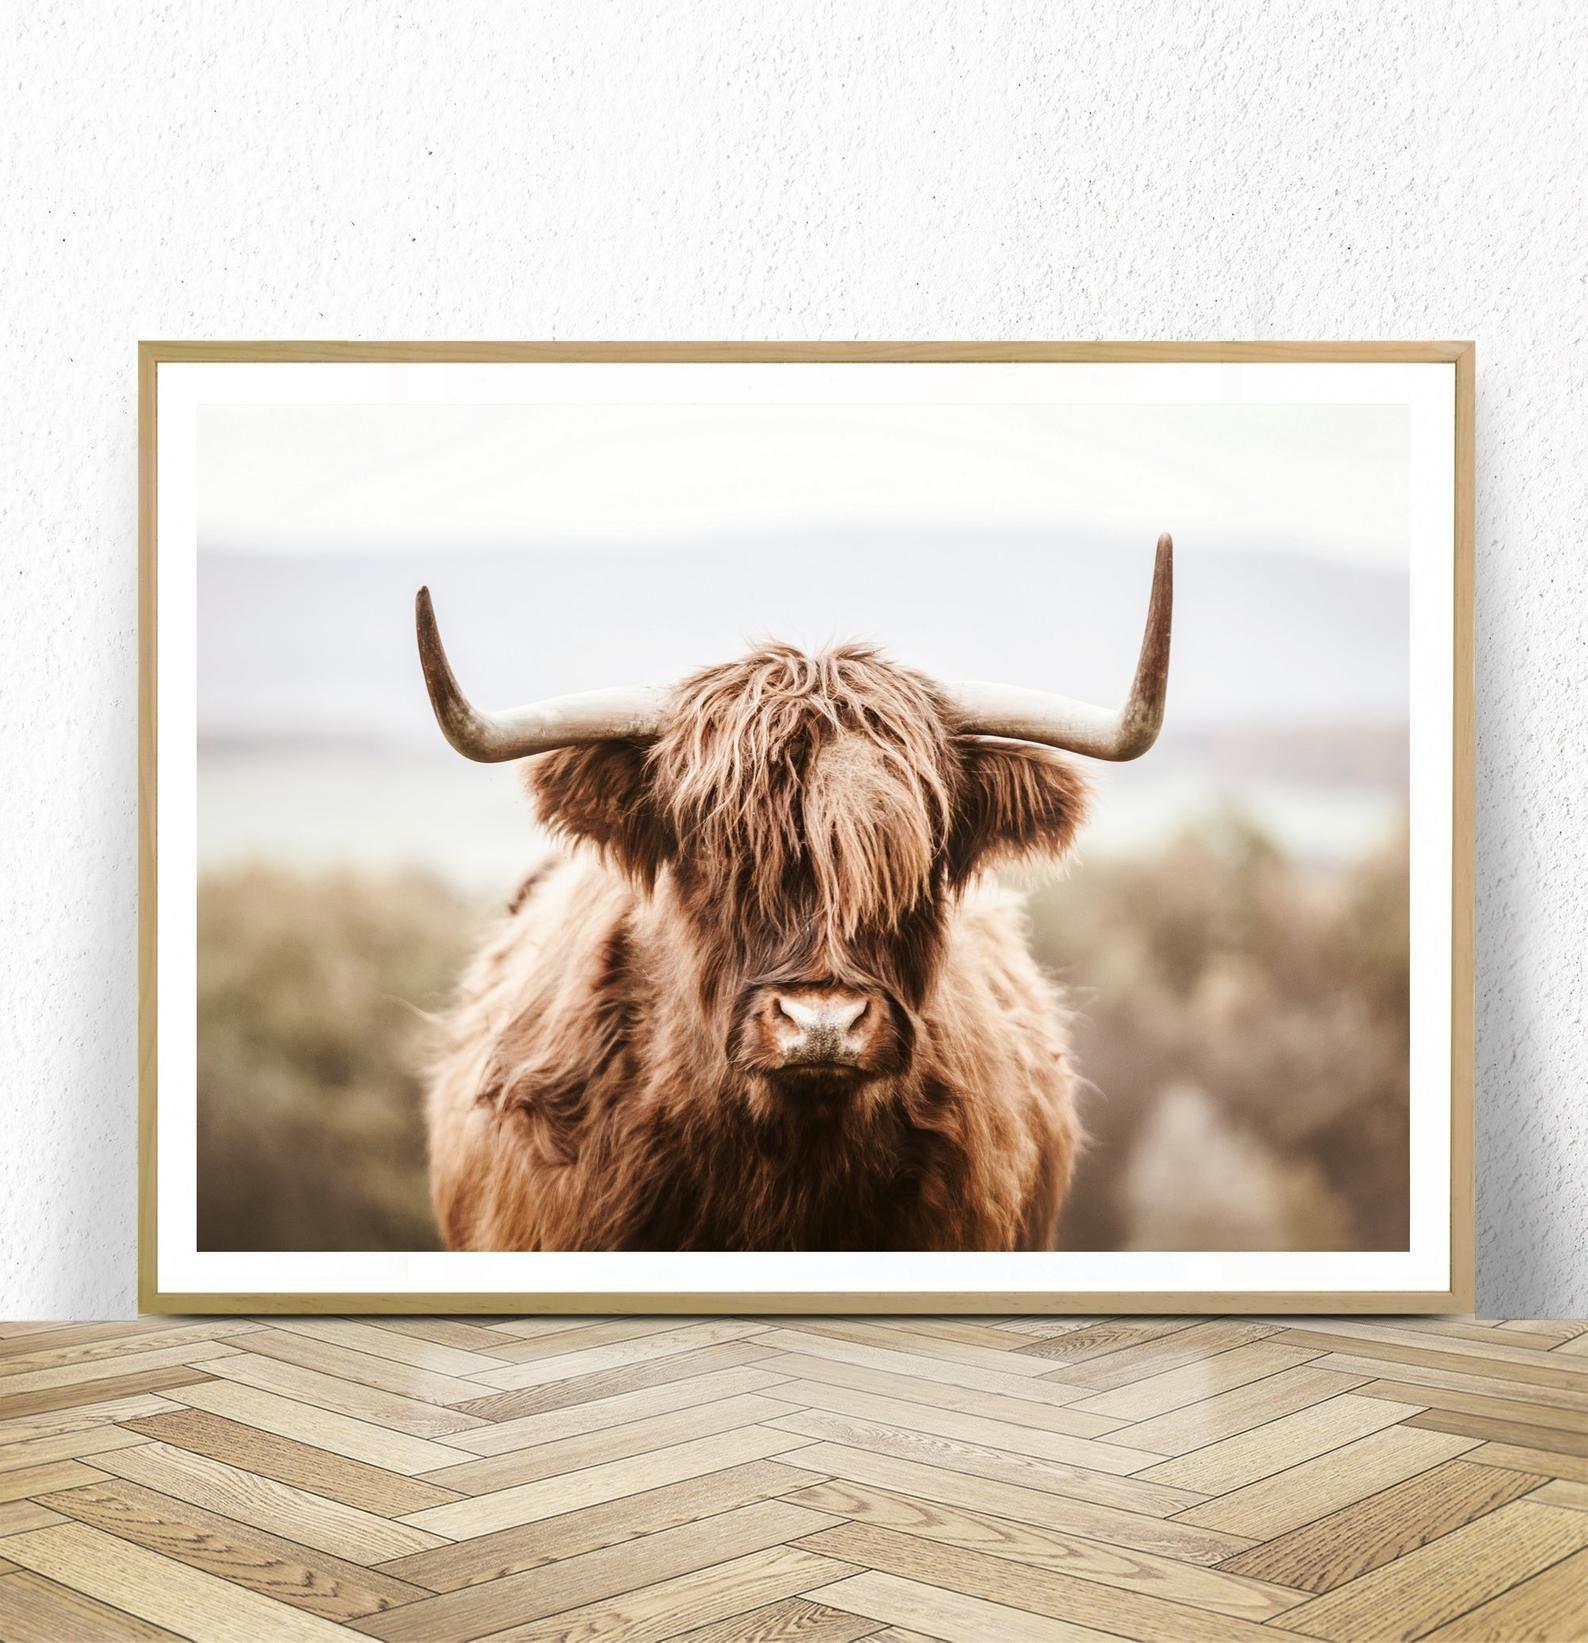 Highland Cow Print Digital Download Farm Animal Print Etsy In 2020 Highland Cow Print Cow Wall Art Farmhouse Wall Art